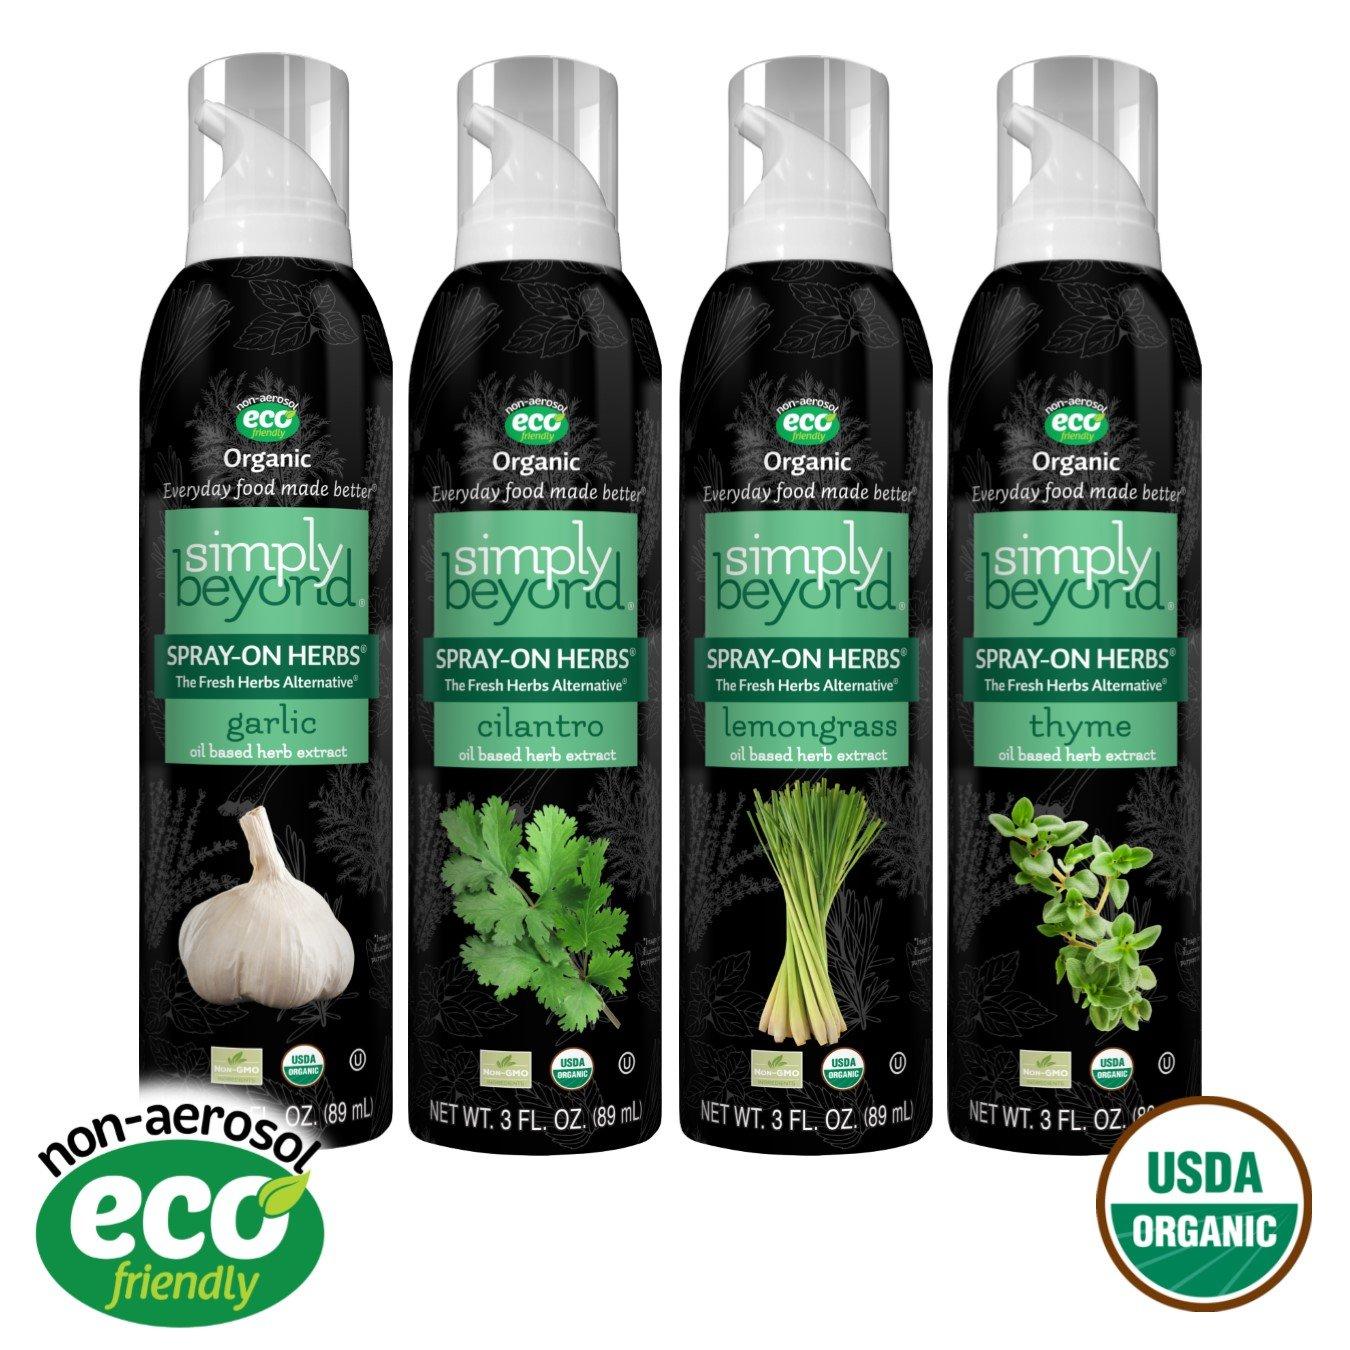 Simply Beyond, Organic Spray-On Herbs 4-Pack (Garlic, Cilantro, Lemongrass, Thyme), 3 Fl. Oz